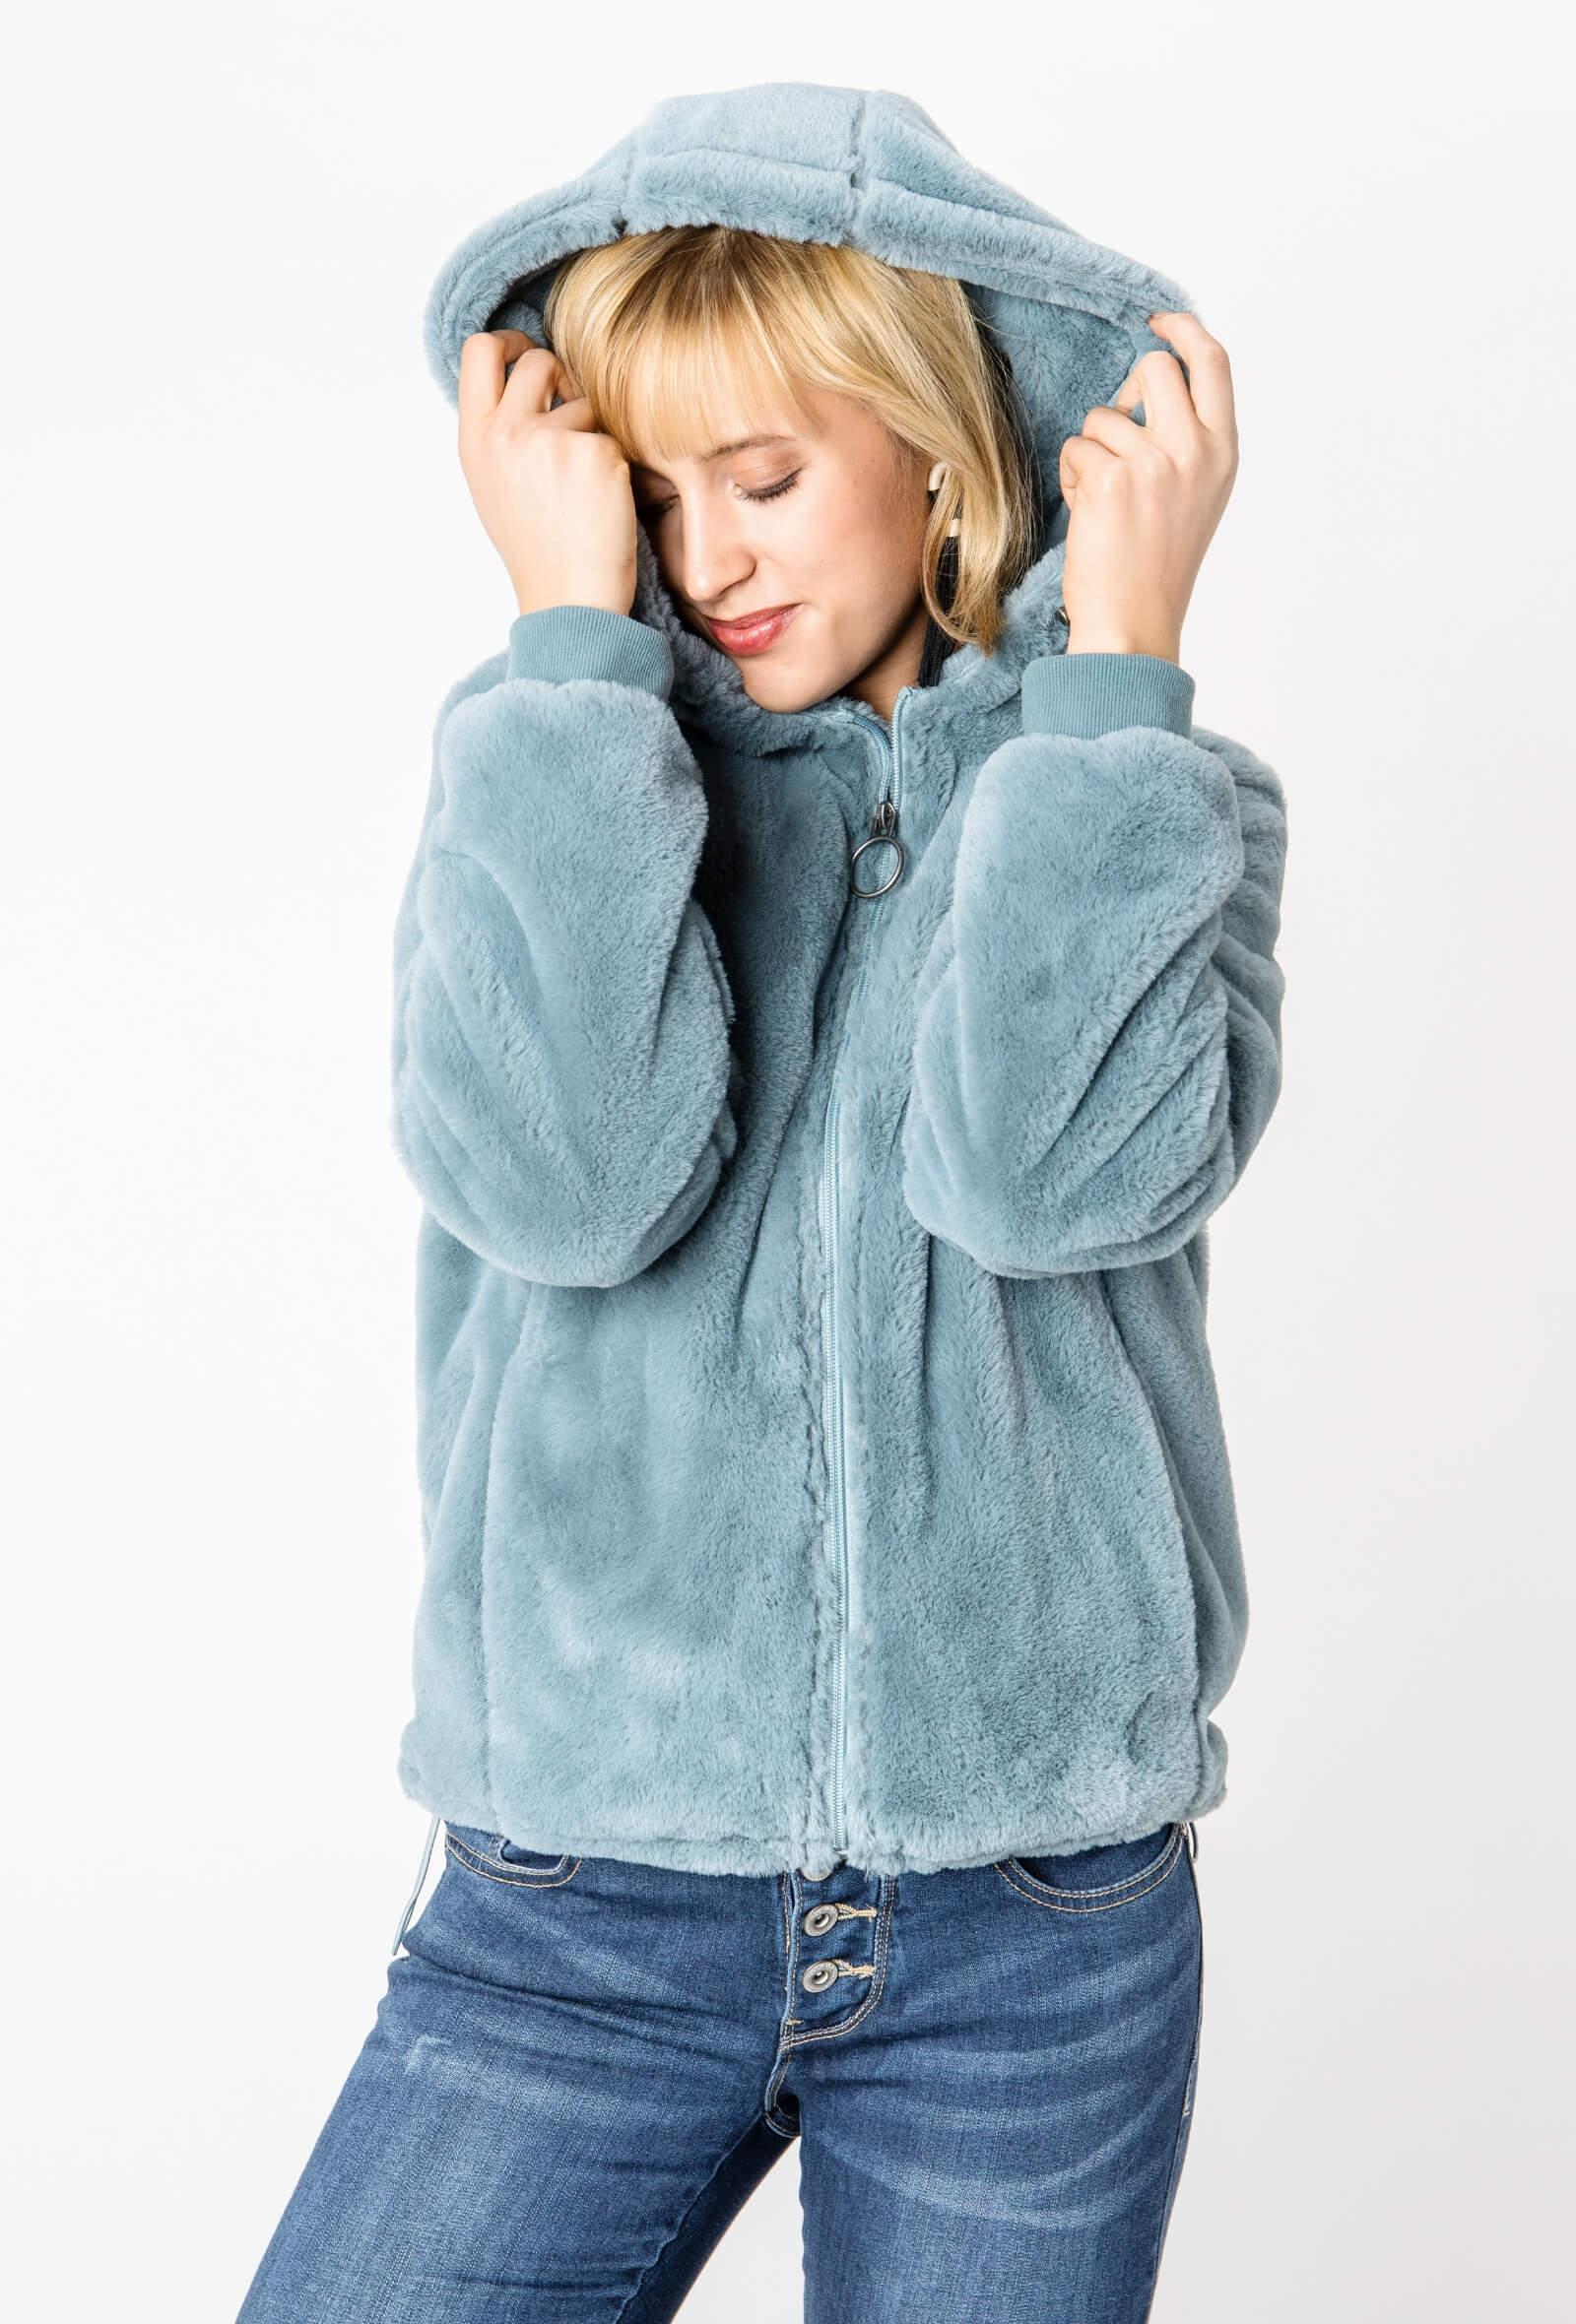 Kuschel-Jacke in Blau